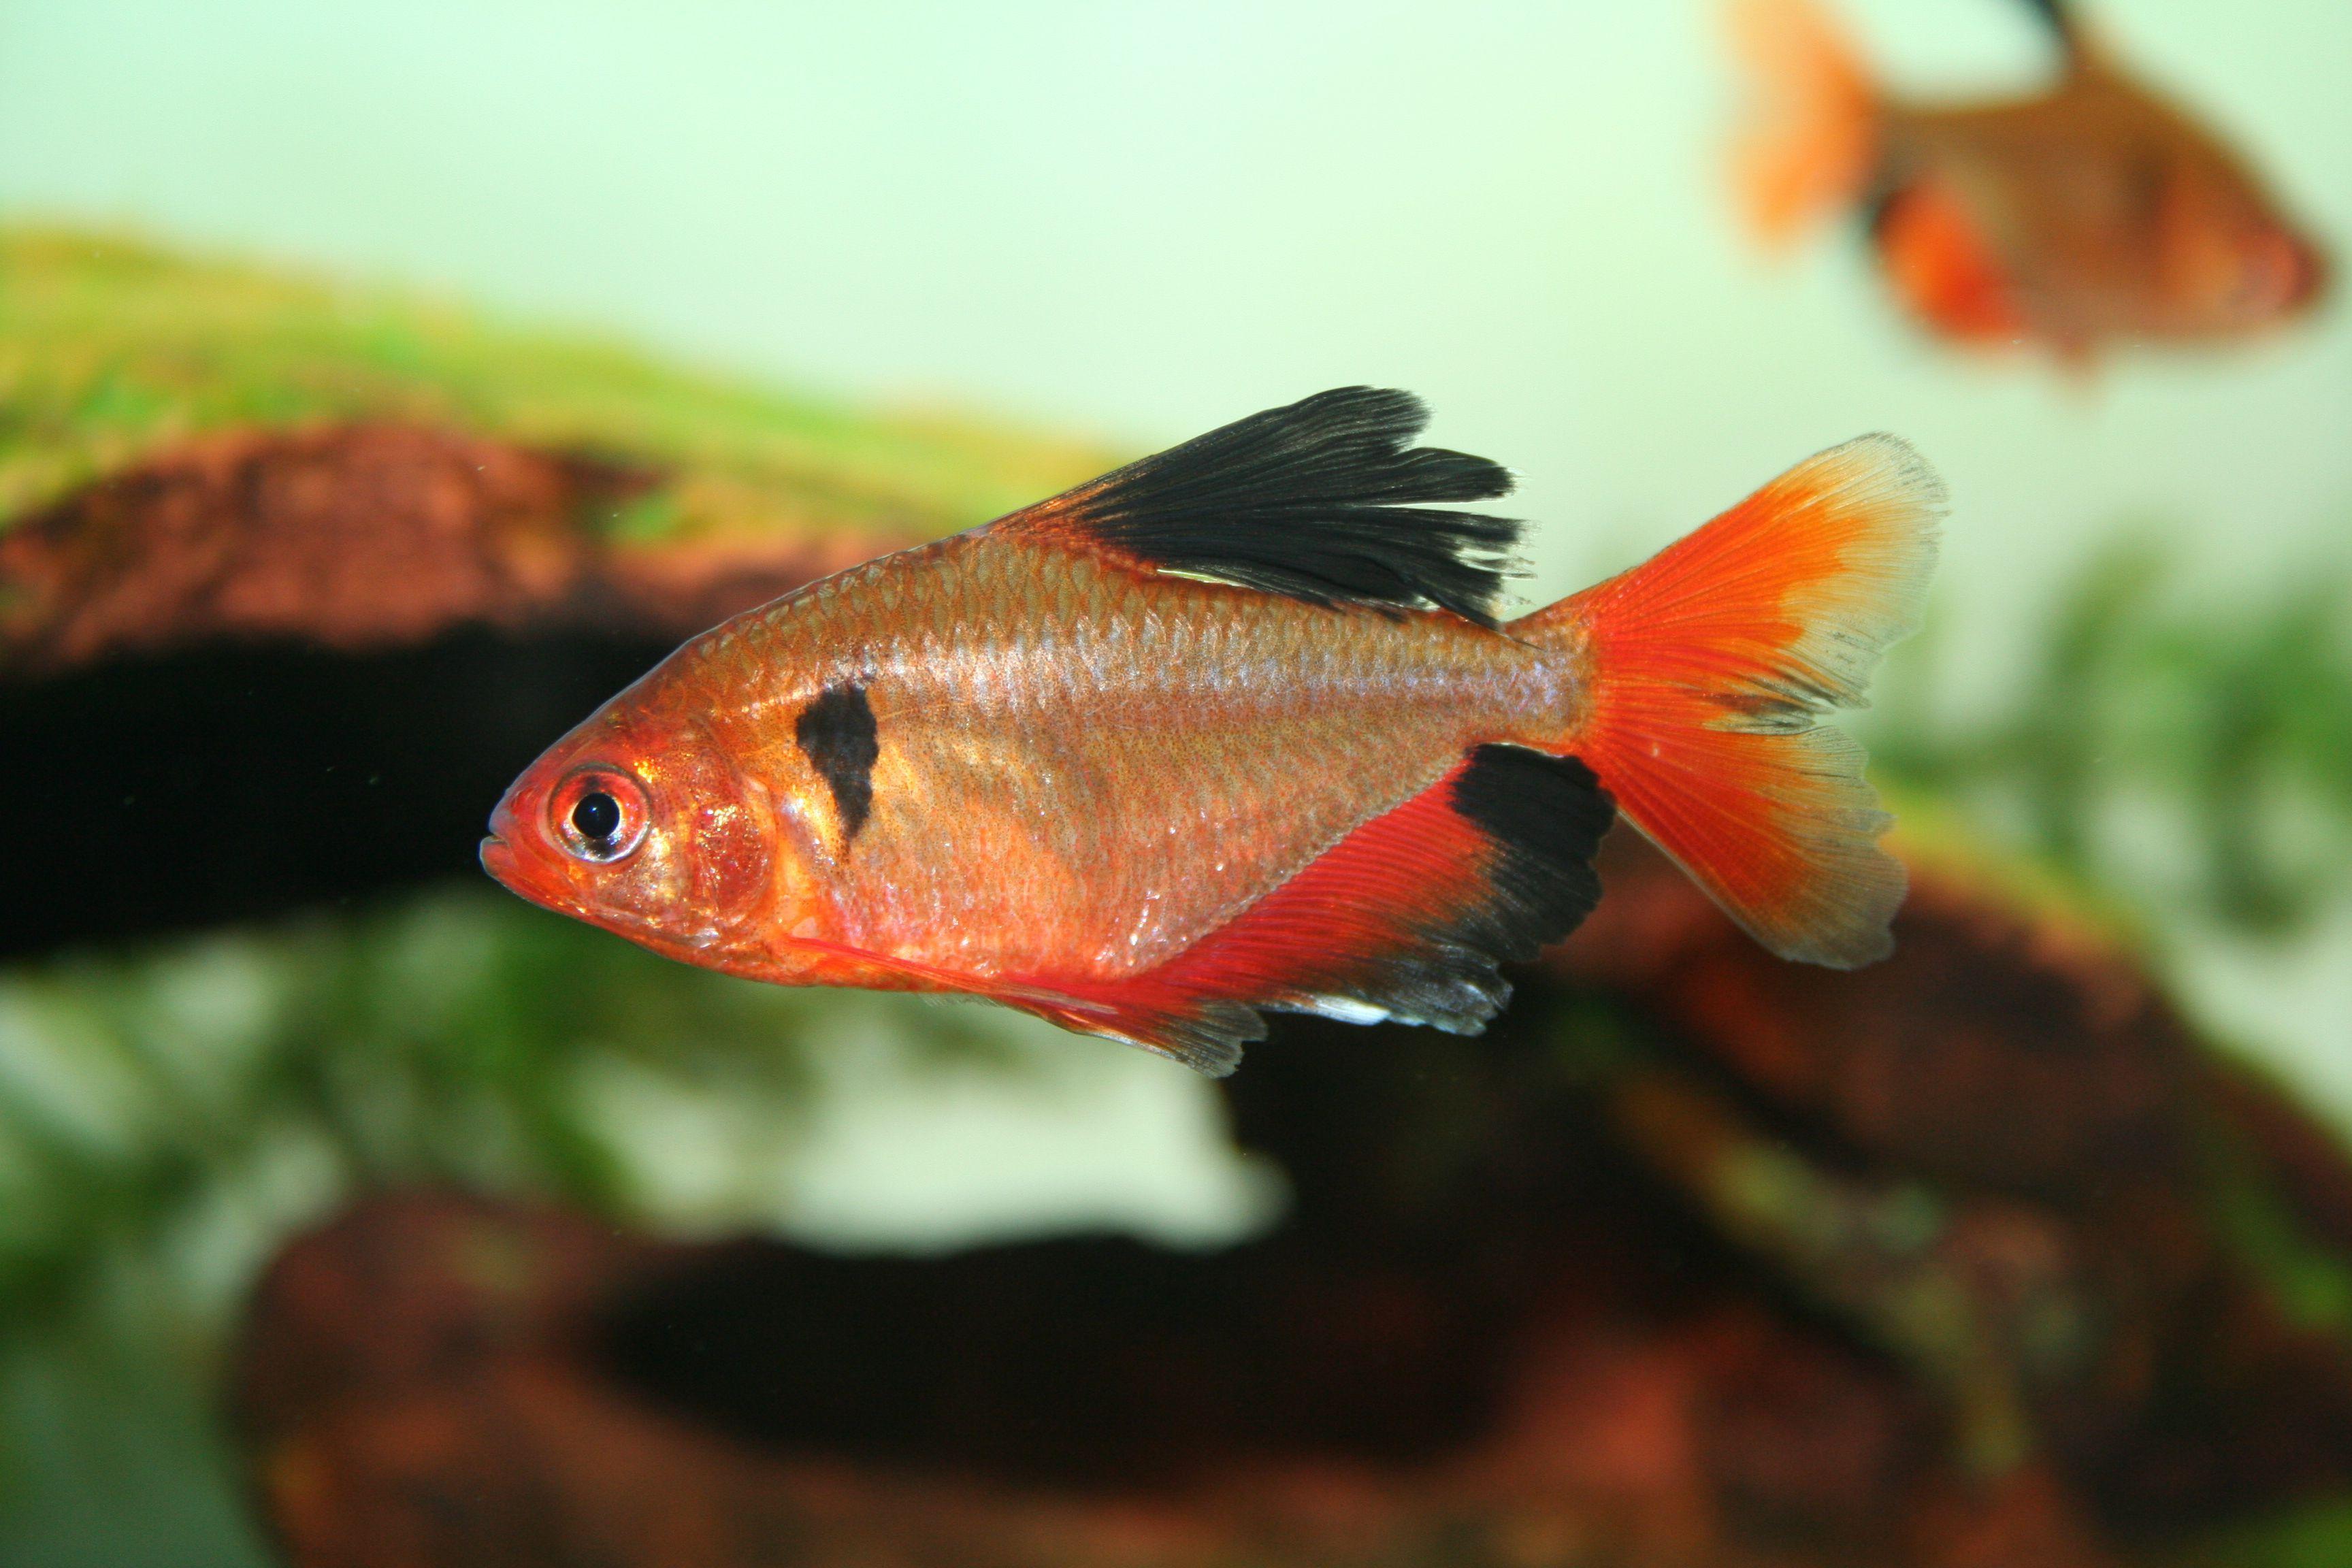 Serpae Tetras Are A Brightly Colored Schooling Fish That Does Well In A Freshwater Community Aquarium Learn Ab In 2020 Tetra Fish Aquarium Fish Tropical Fish Aquarium